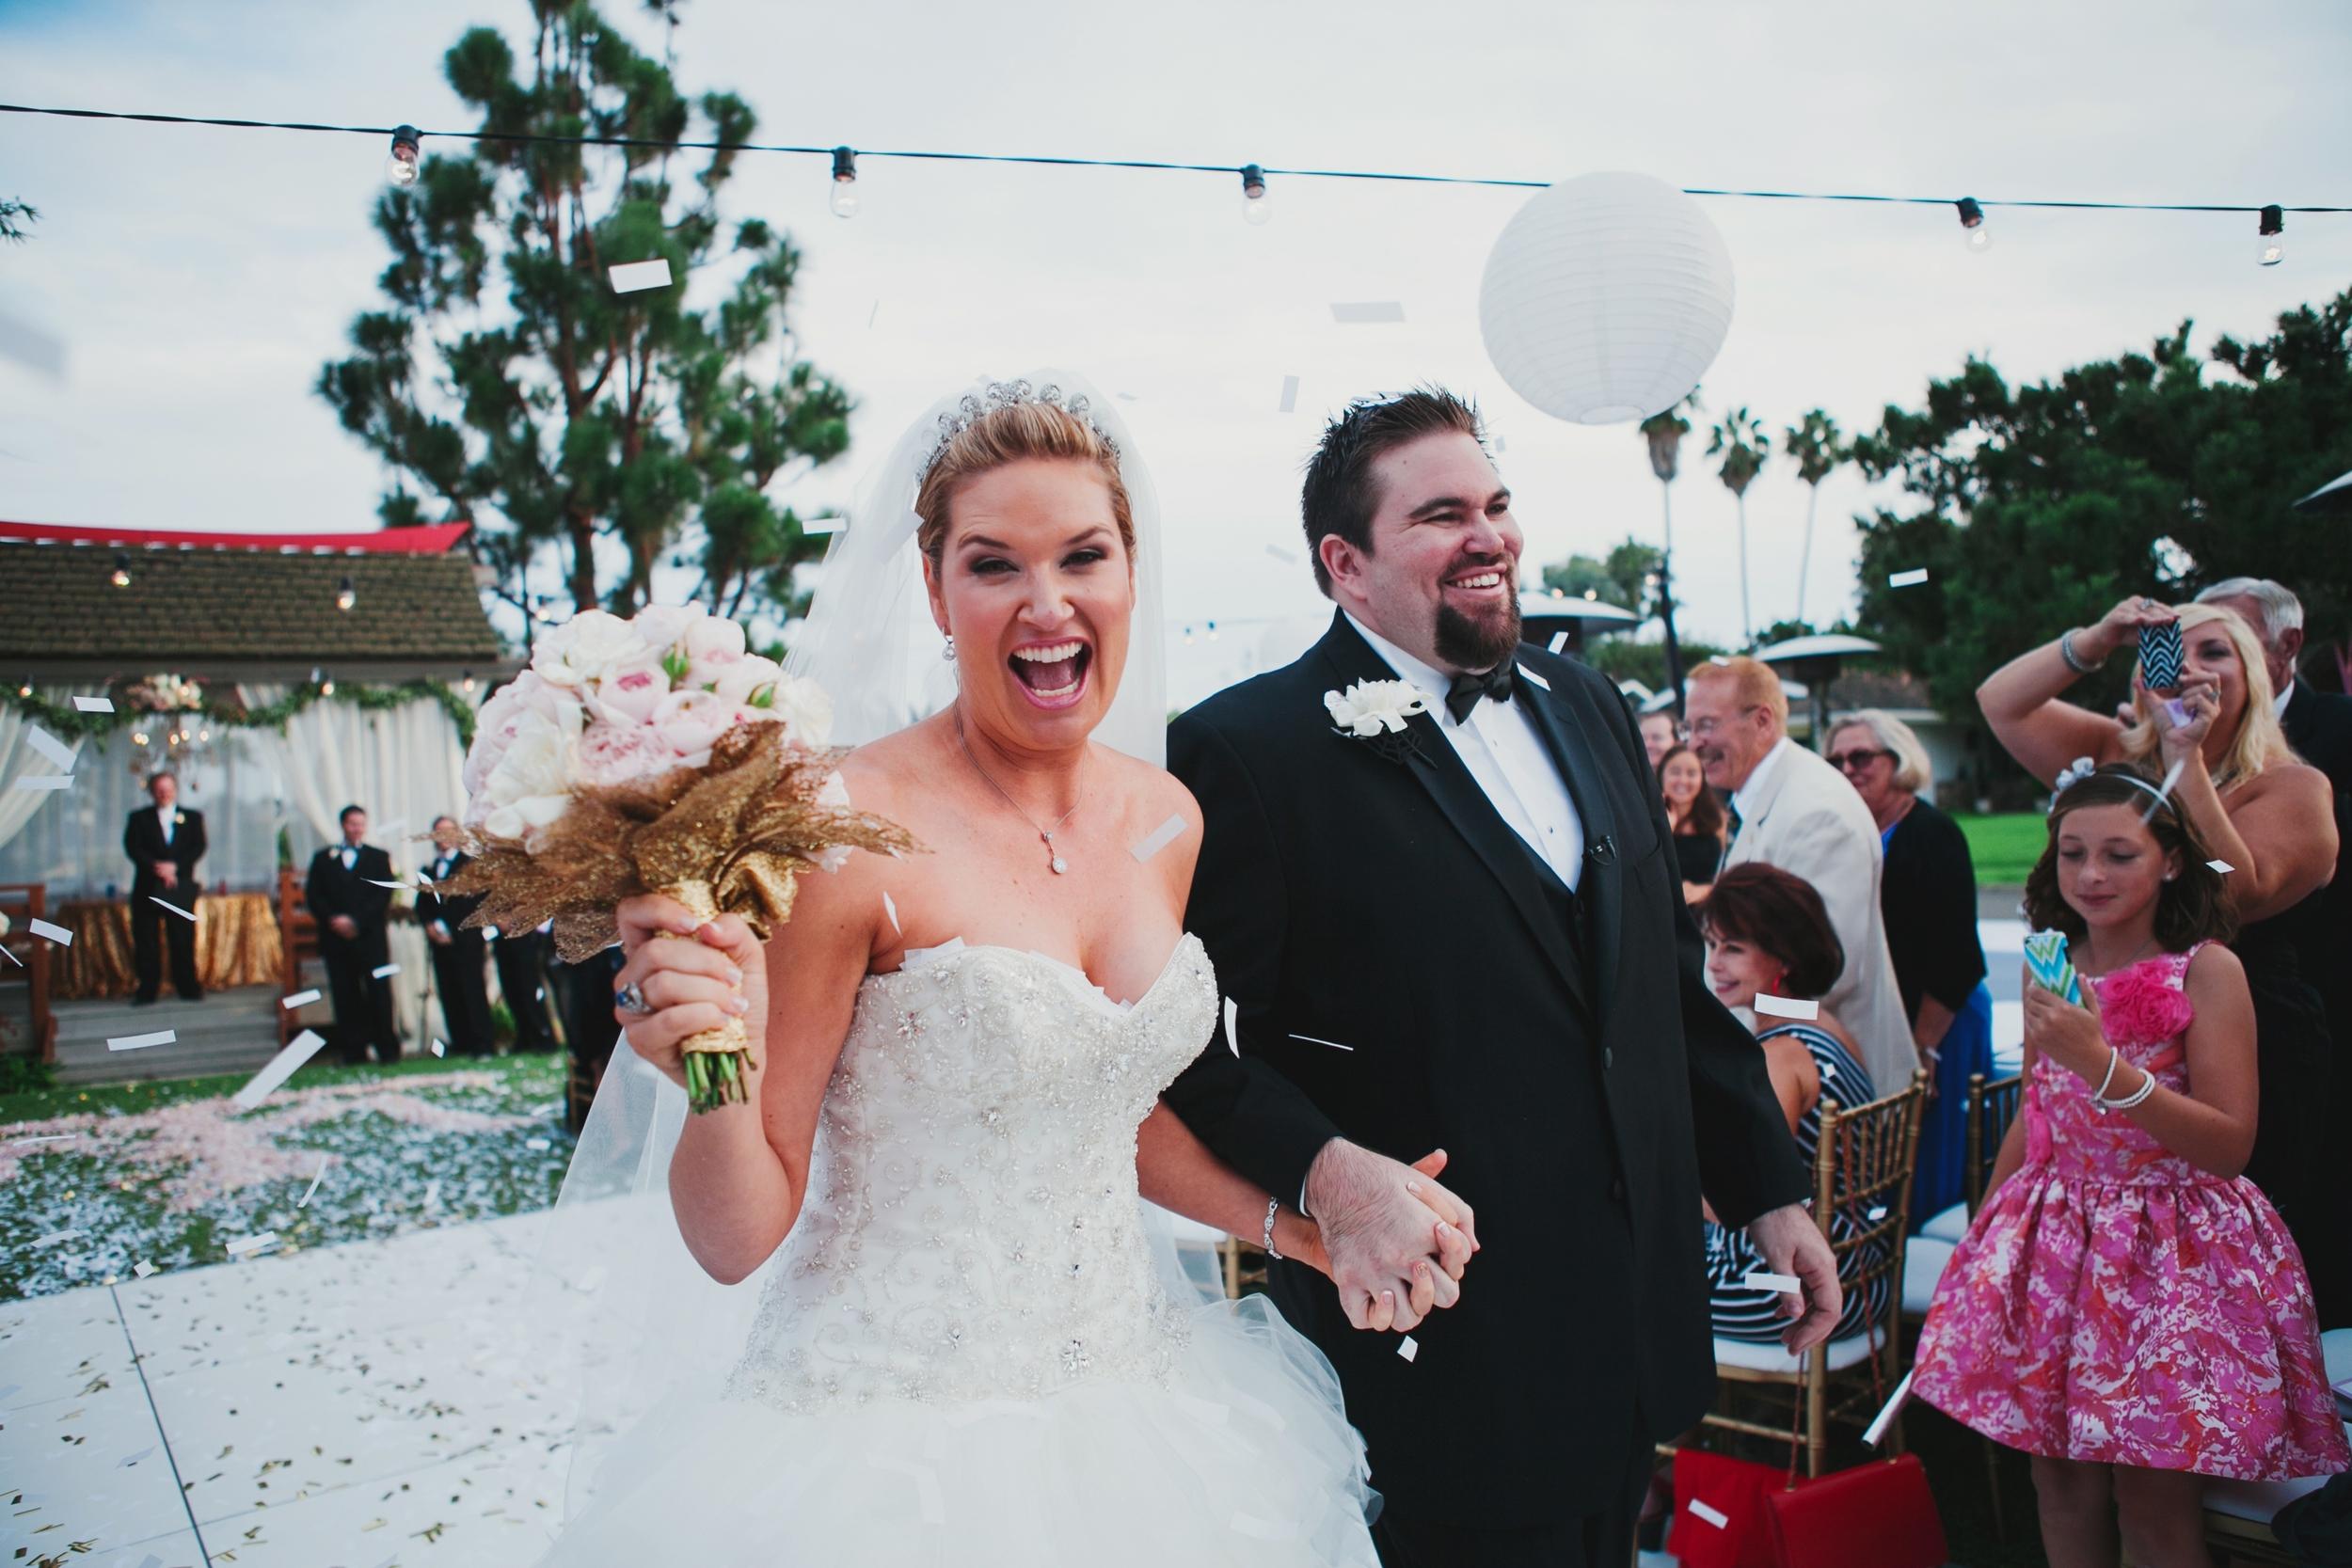 The-Suitcase-Studio-Timree-Matt-Lifestyle-Wedding-Photographer-055.jpg